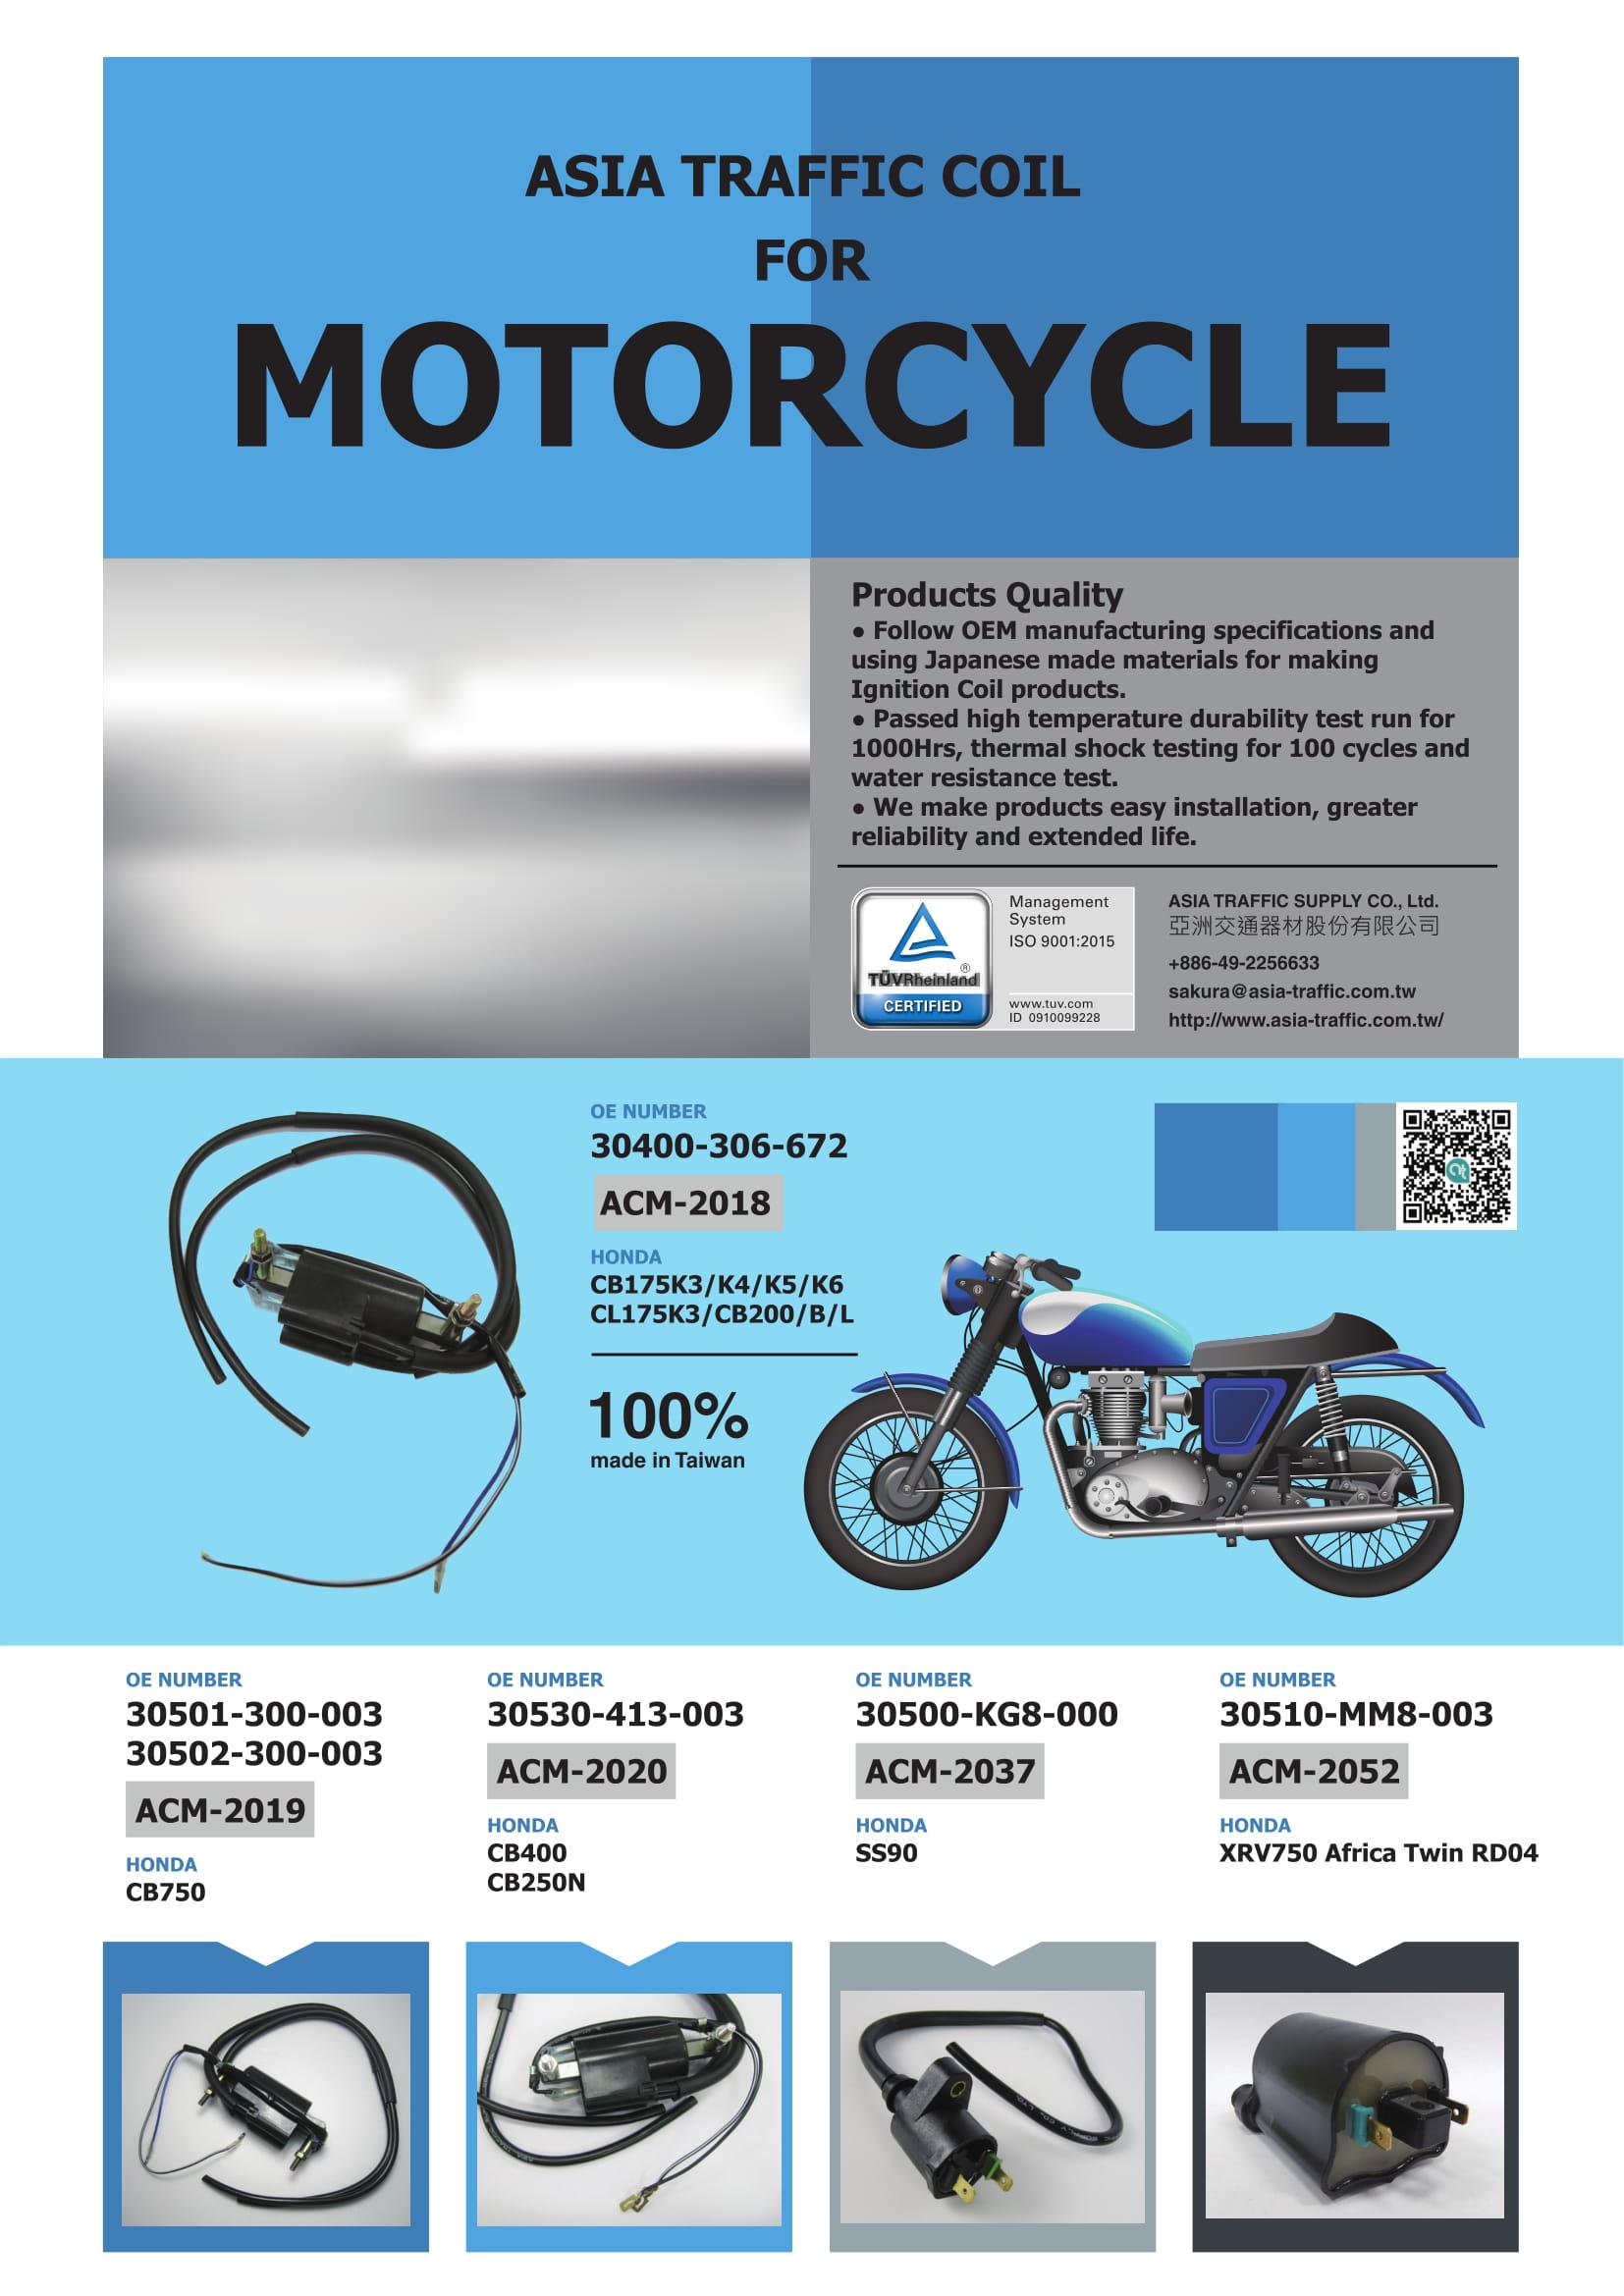 800 Wiring Diagram Also Honda Cb500 Four On Honda Cb500 Parts Diagram